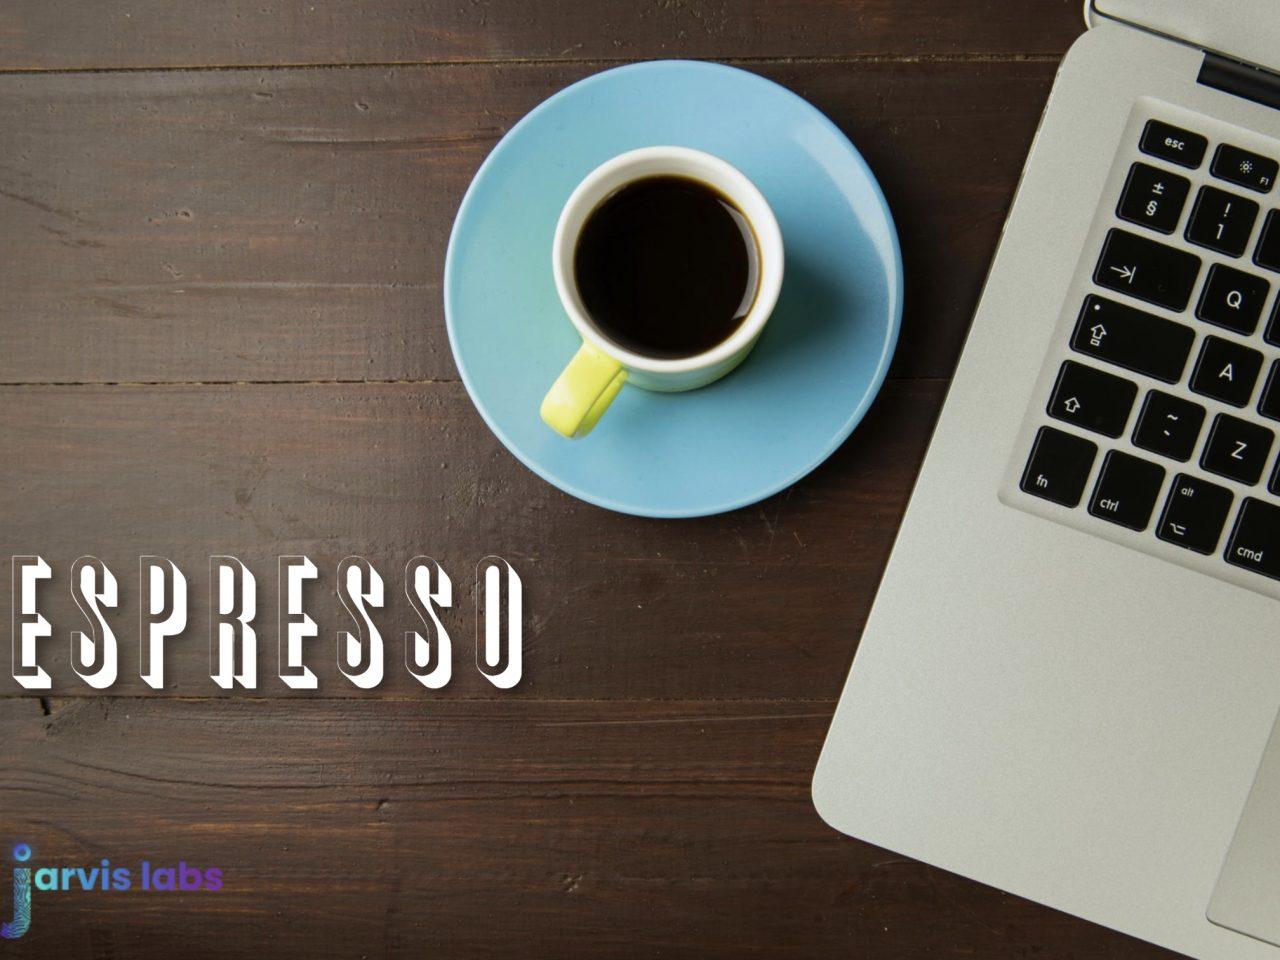 https://goodkarma.capital/wp-content/uploads/2021/06/Jarvis-Labs-Espresso-1280x960.jpg